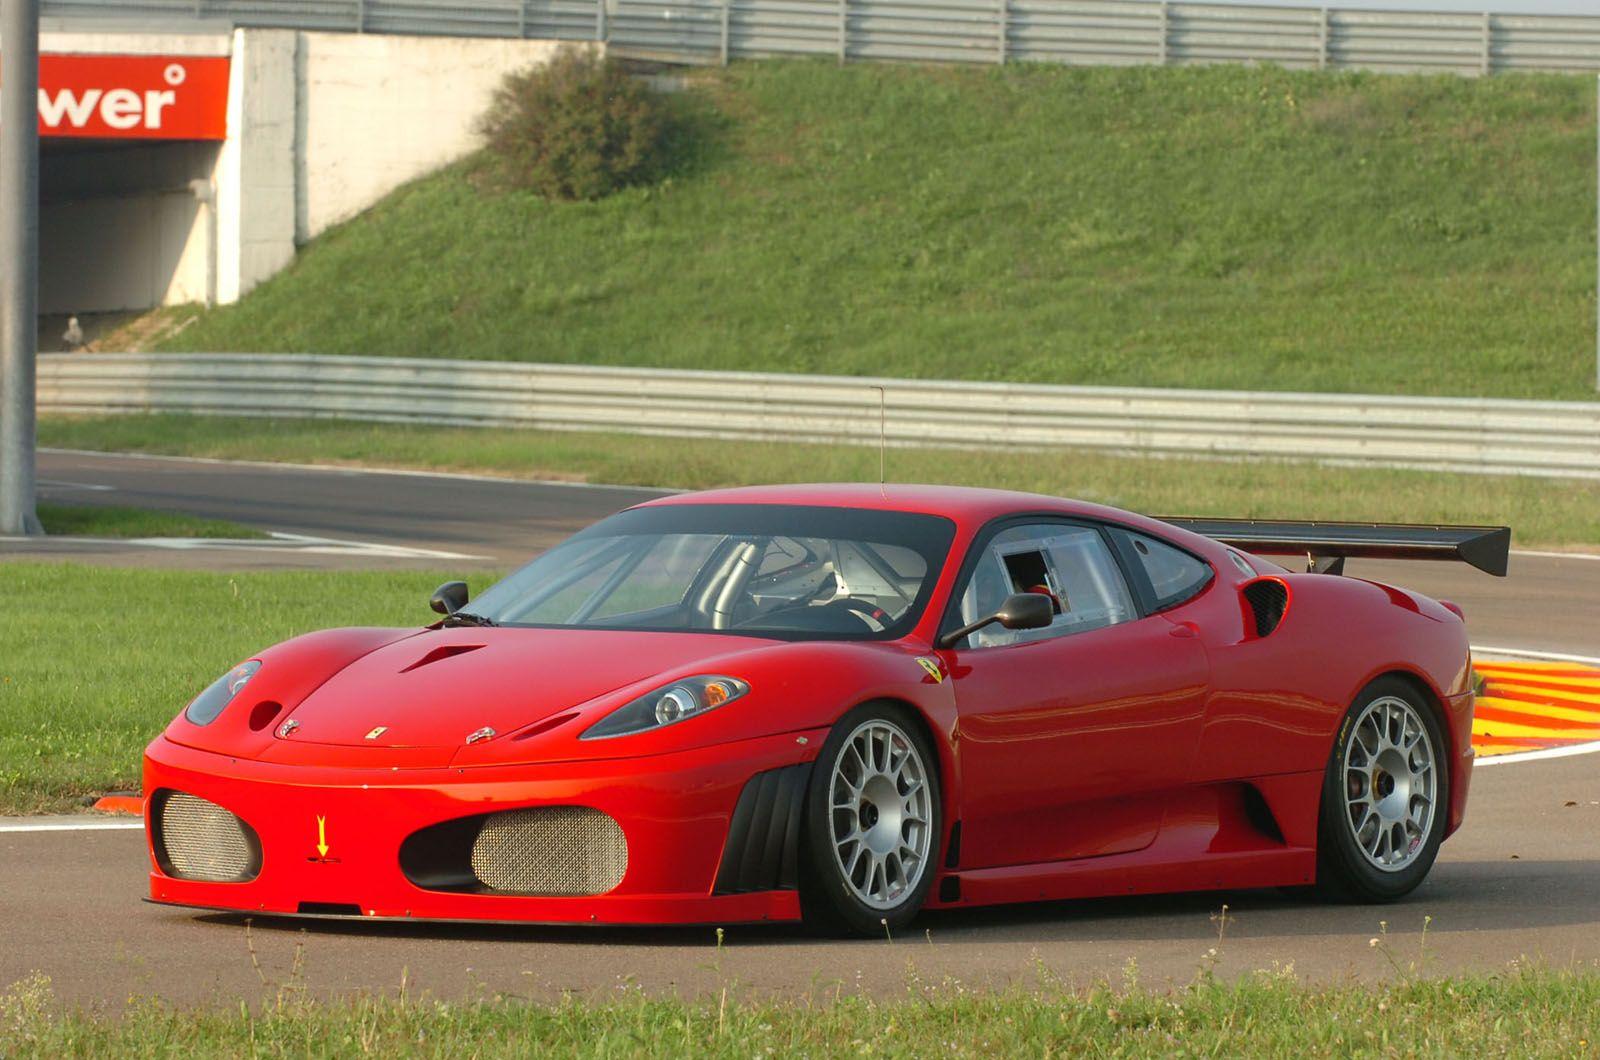 F430 Cheapest Ferrari On The Market Now Ferrari F430 Ferrari Ferrari Racing